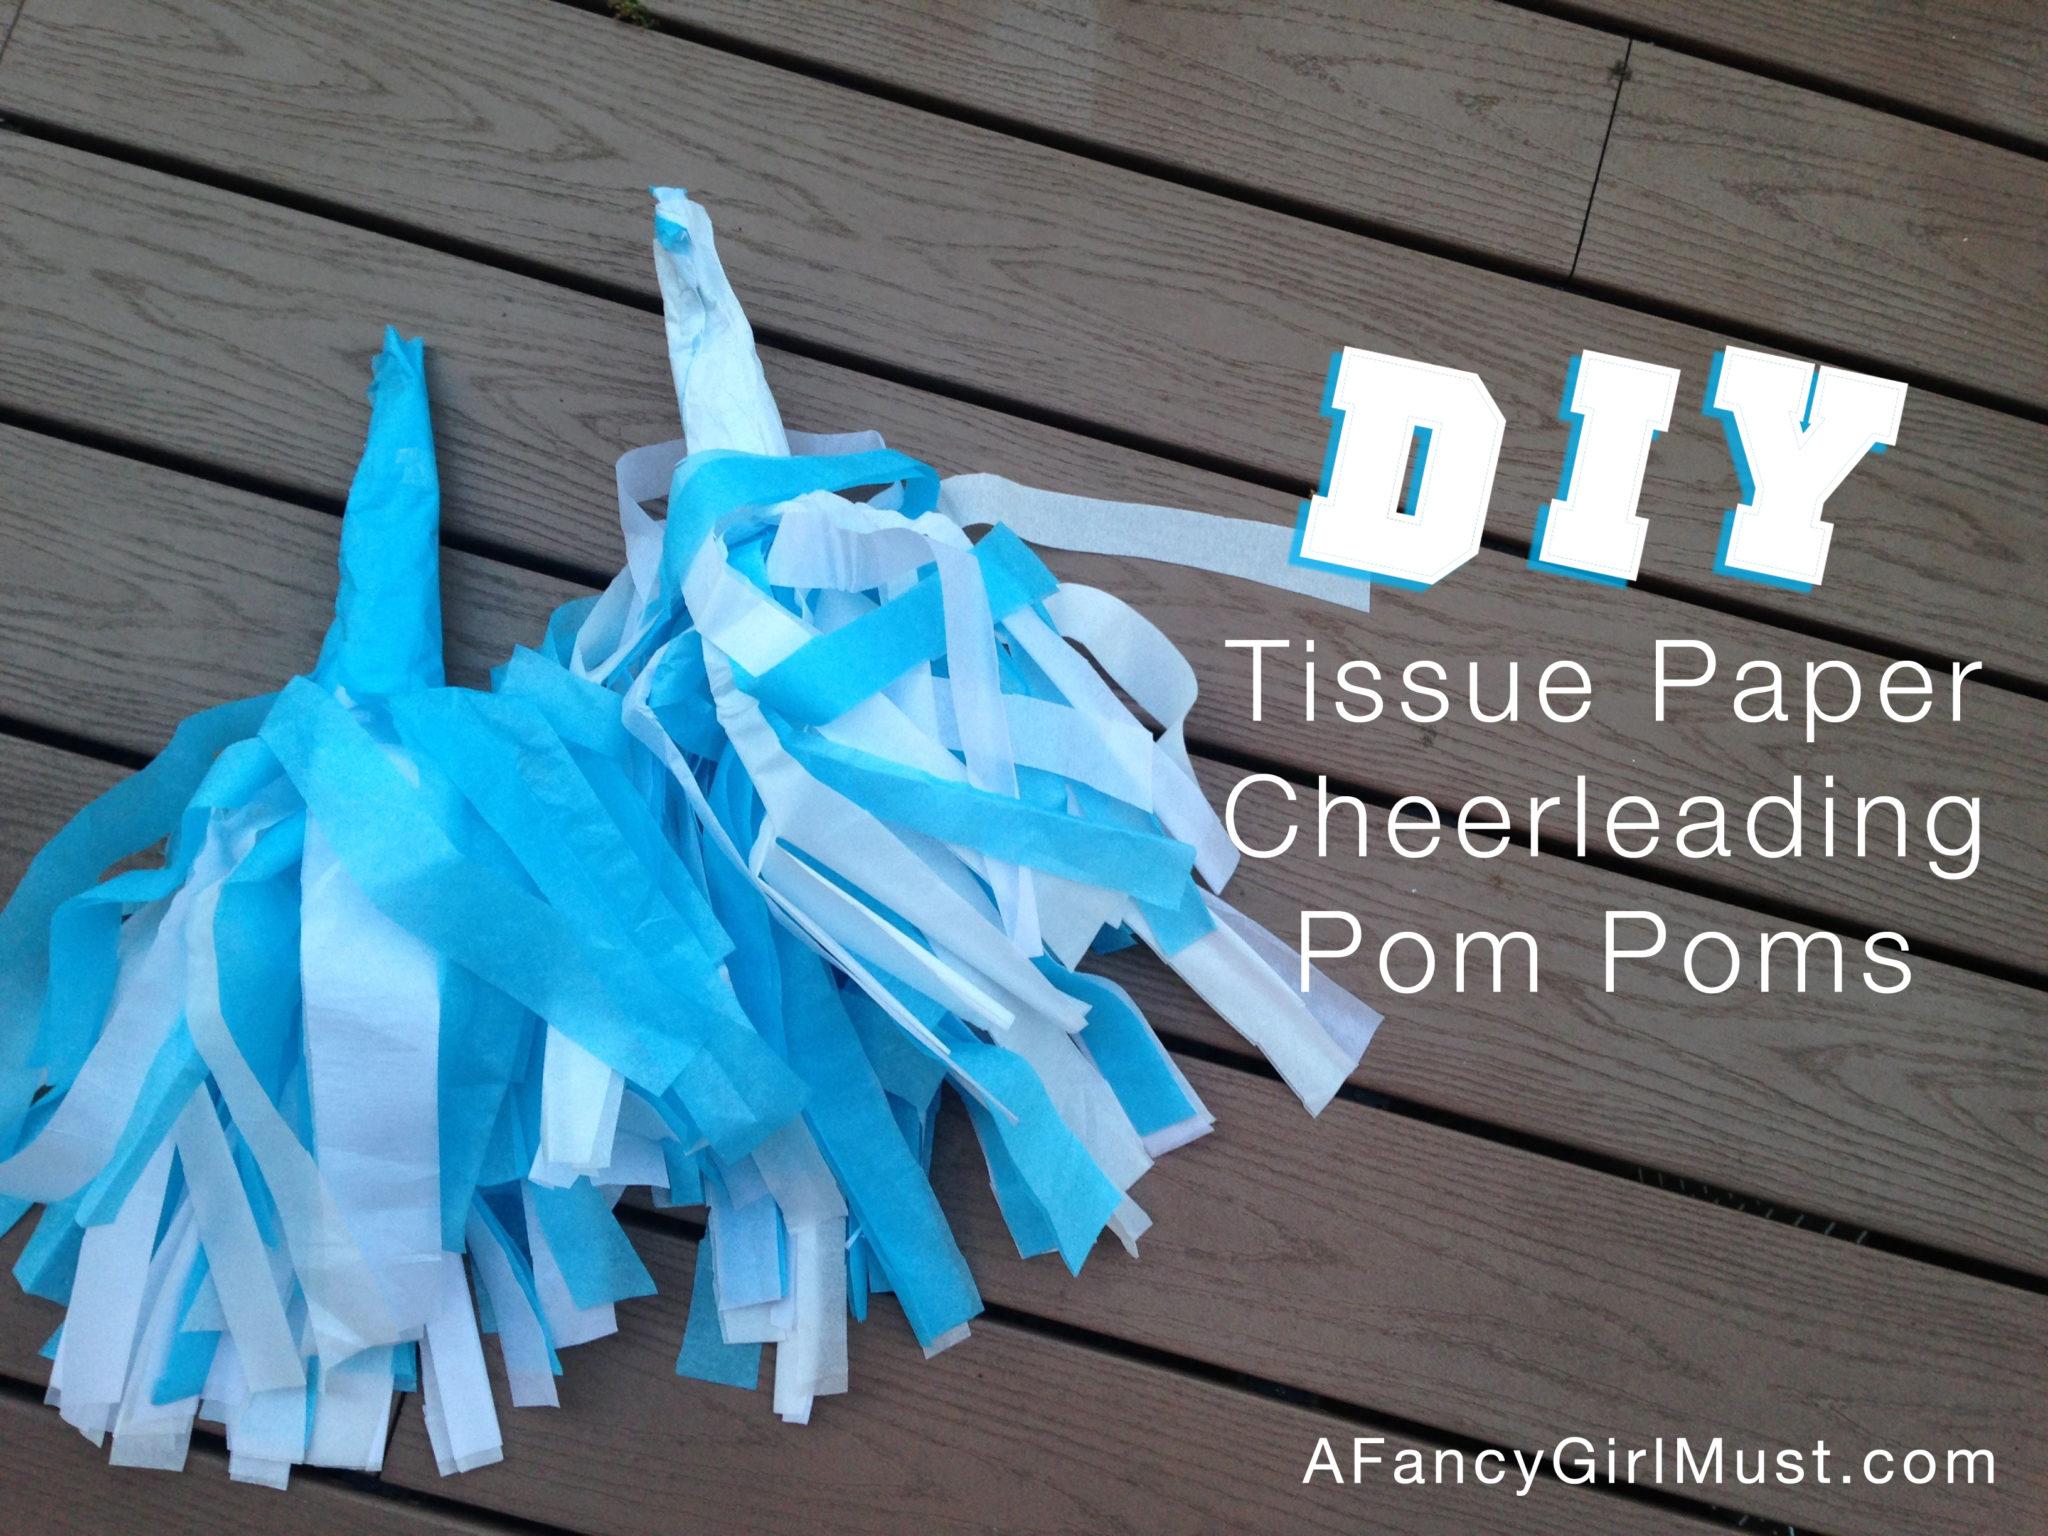 DIY Tissue Paper Cheerleading Pom Poms | A Fancy Girl Must